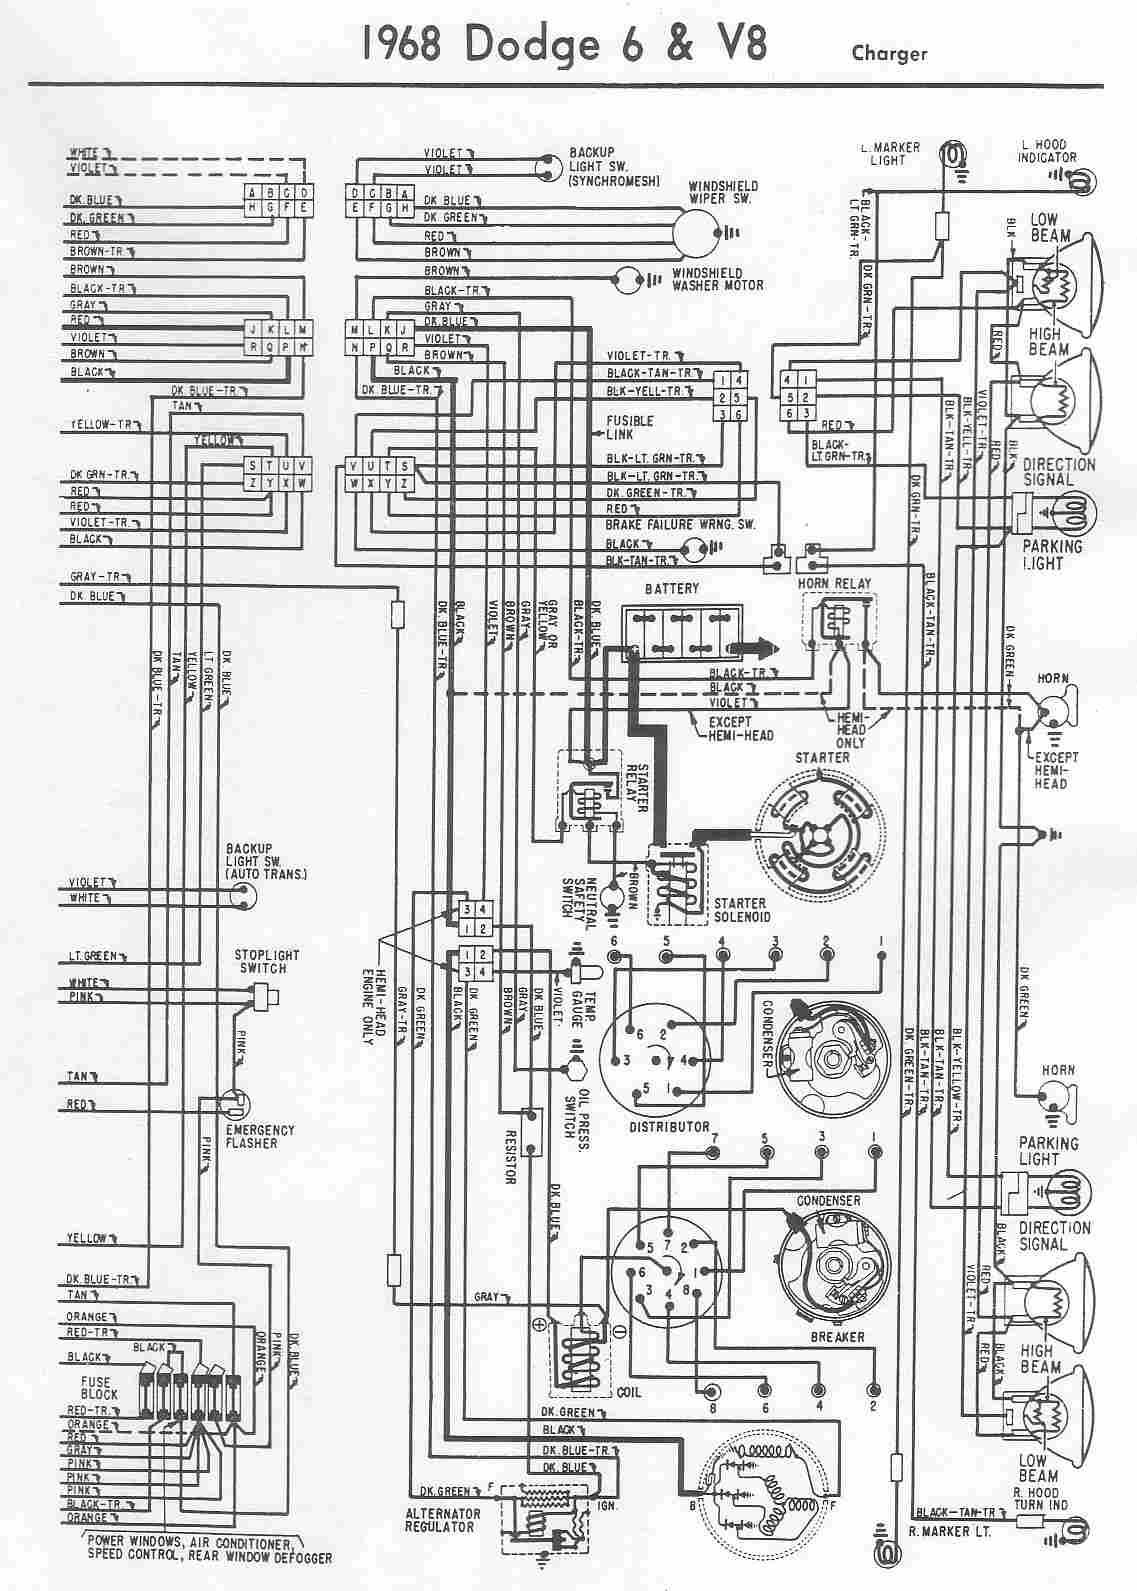 2013 dodge avenger fuse box layout 2014 dodge avenger fuse diagram wiring diagram 2010 dodge avenger [ 1137 x 1591 Pixel ]